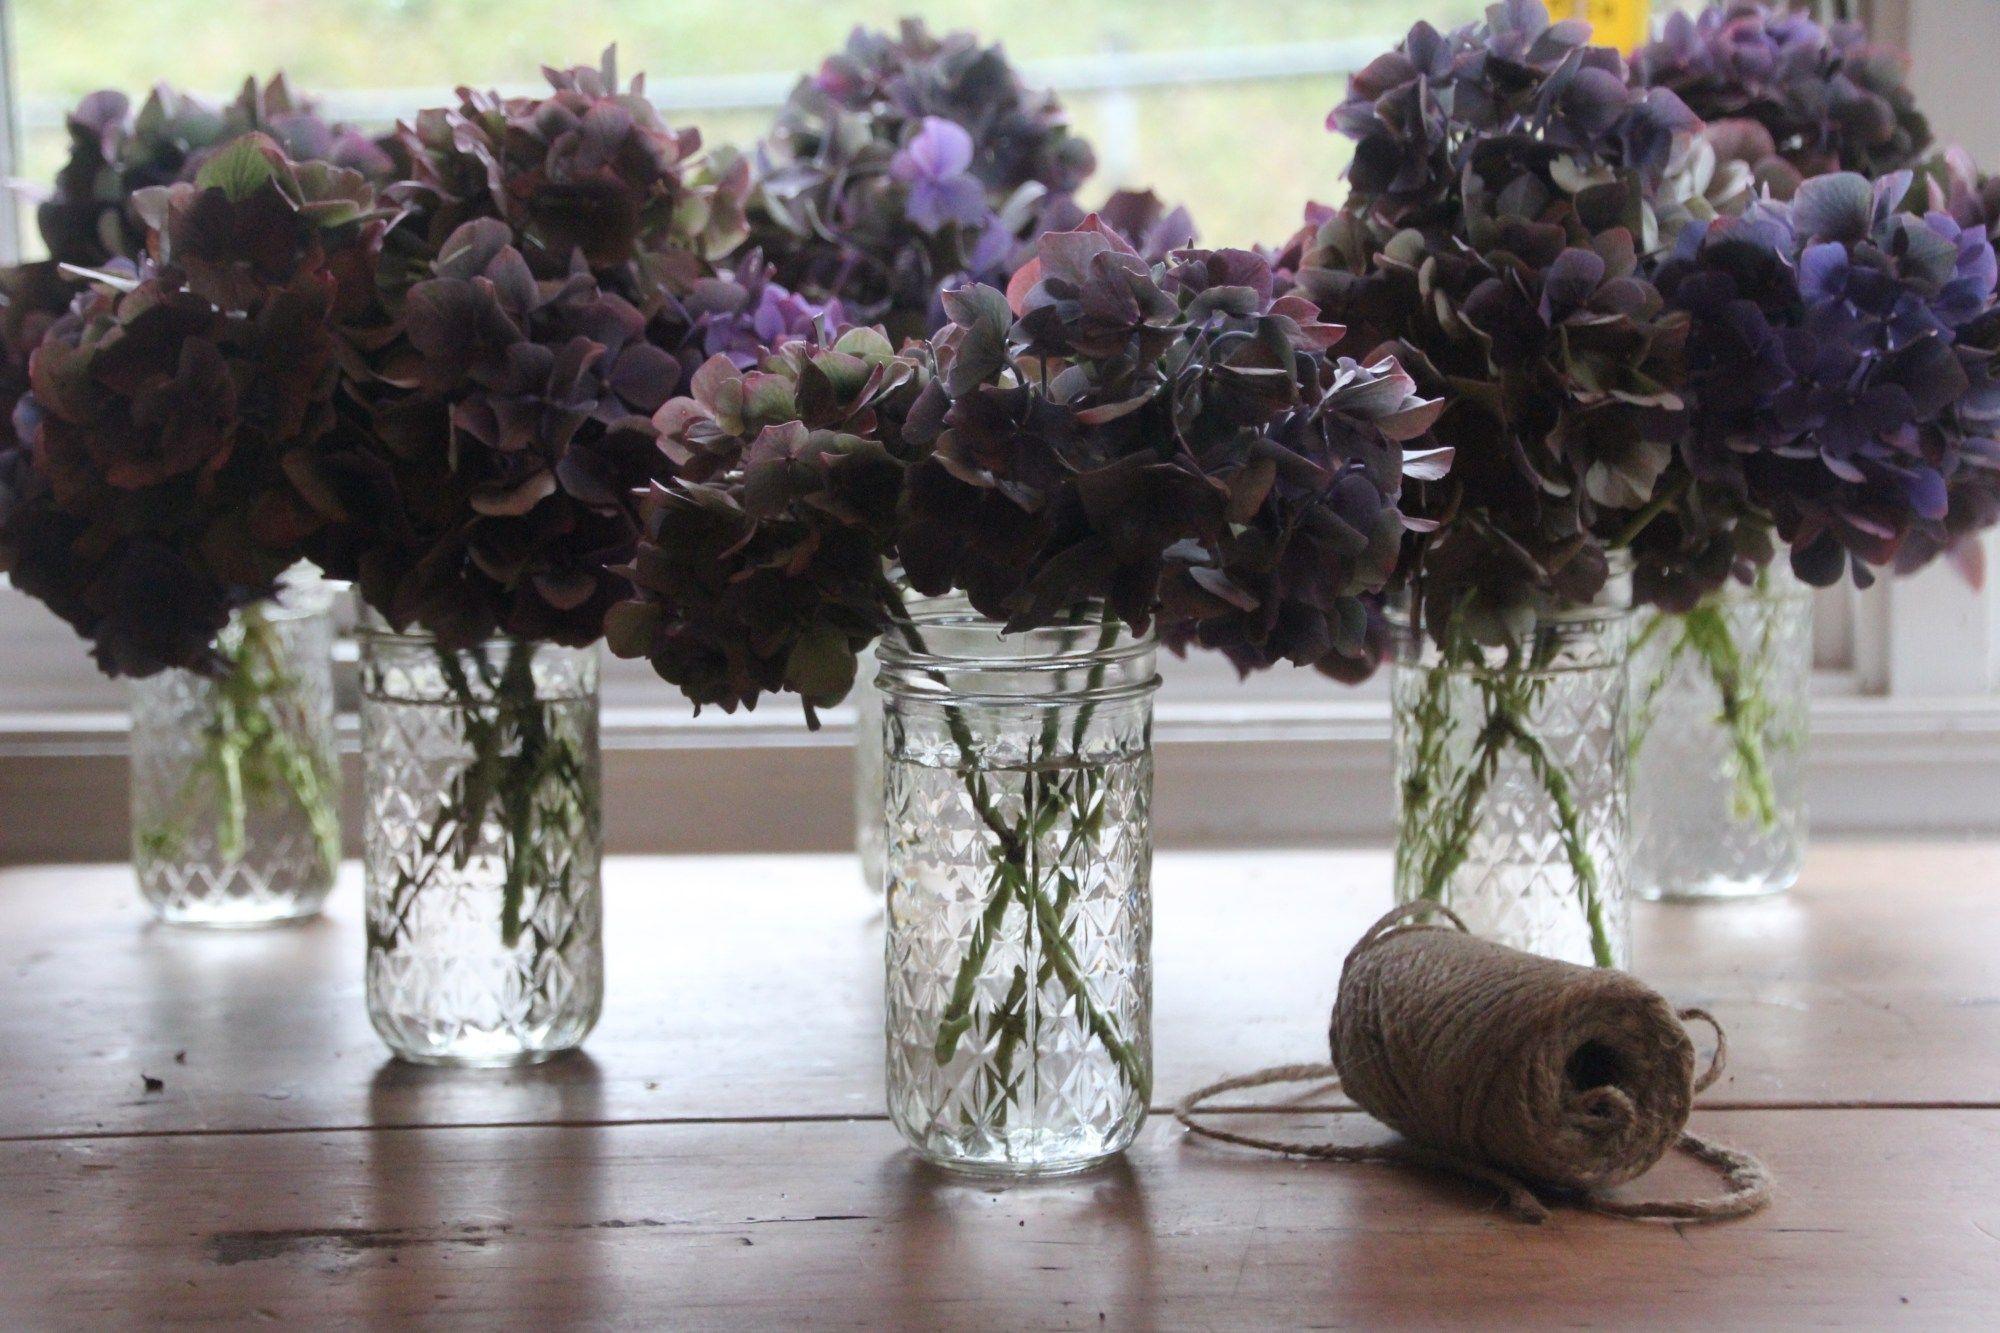 How To Dry Hydrangeas And Make A Dried Hydrangea Wreath A Country Girl S Life In 2020 Dried Hydrangeas Dried Flowers Hydrangea